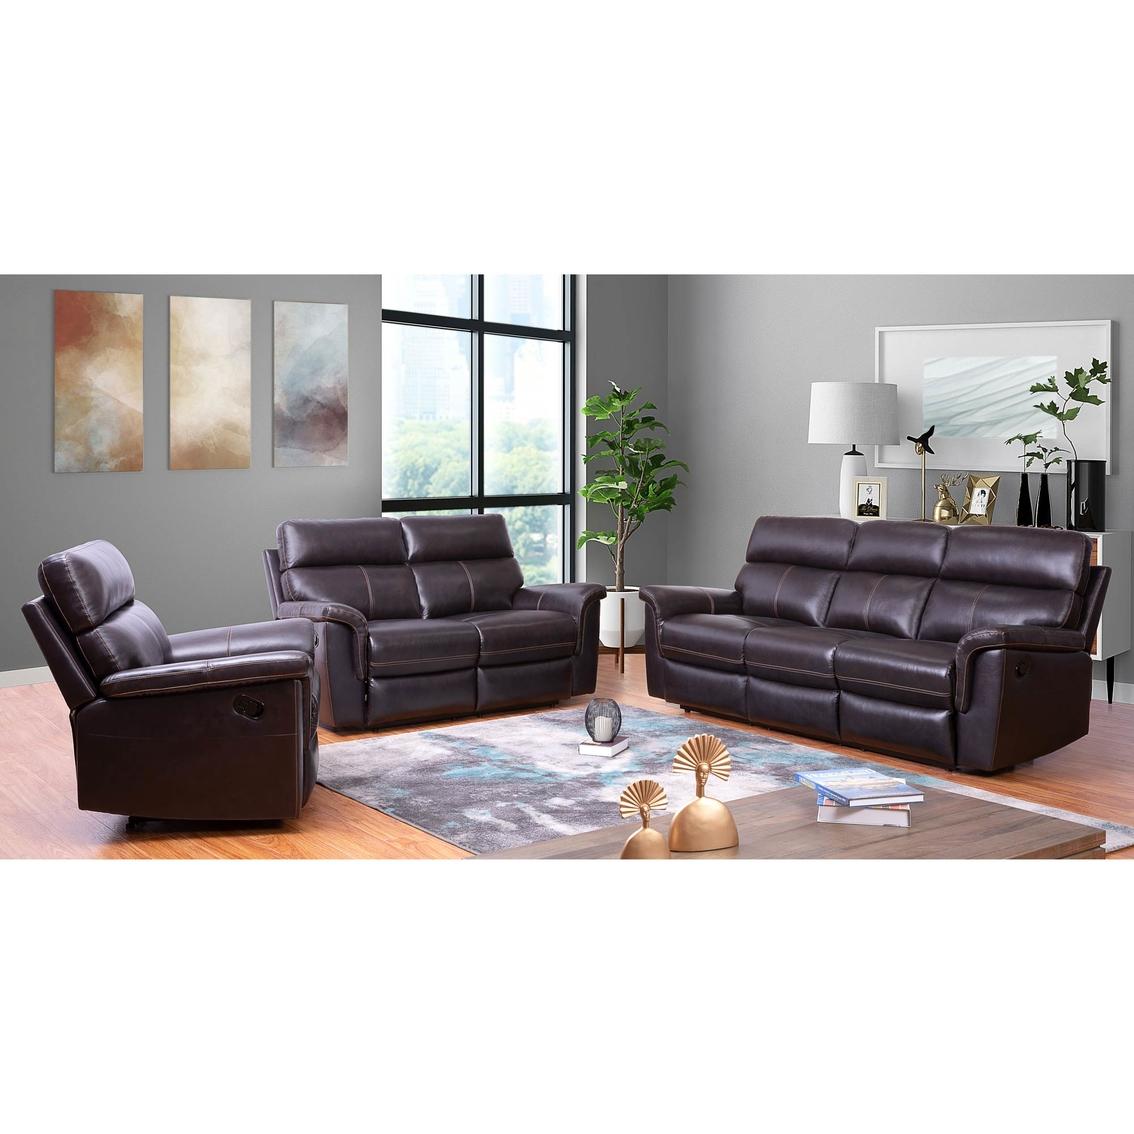 Abbyson Wakefield Top Grain Brown Recliner Leather Sofa Set ...